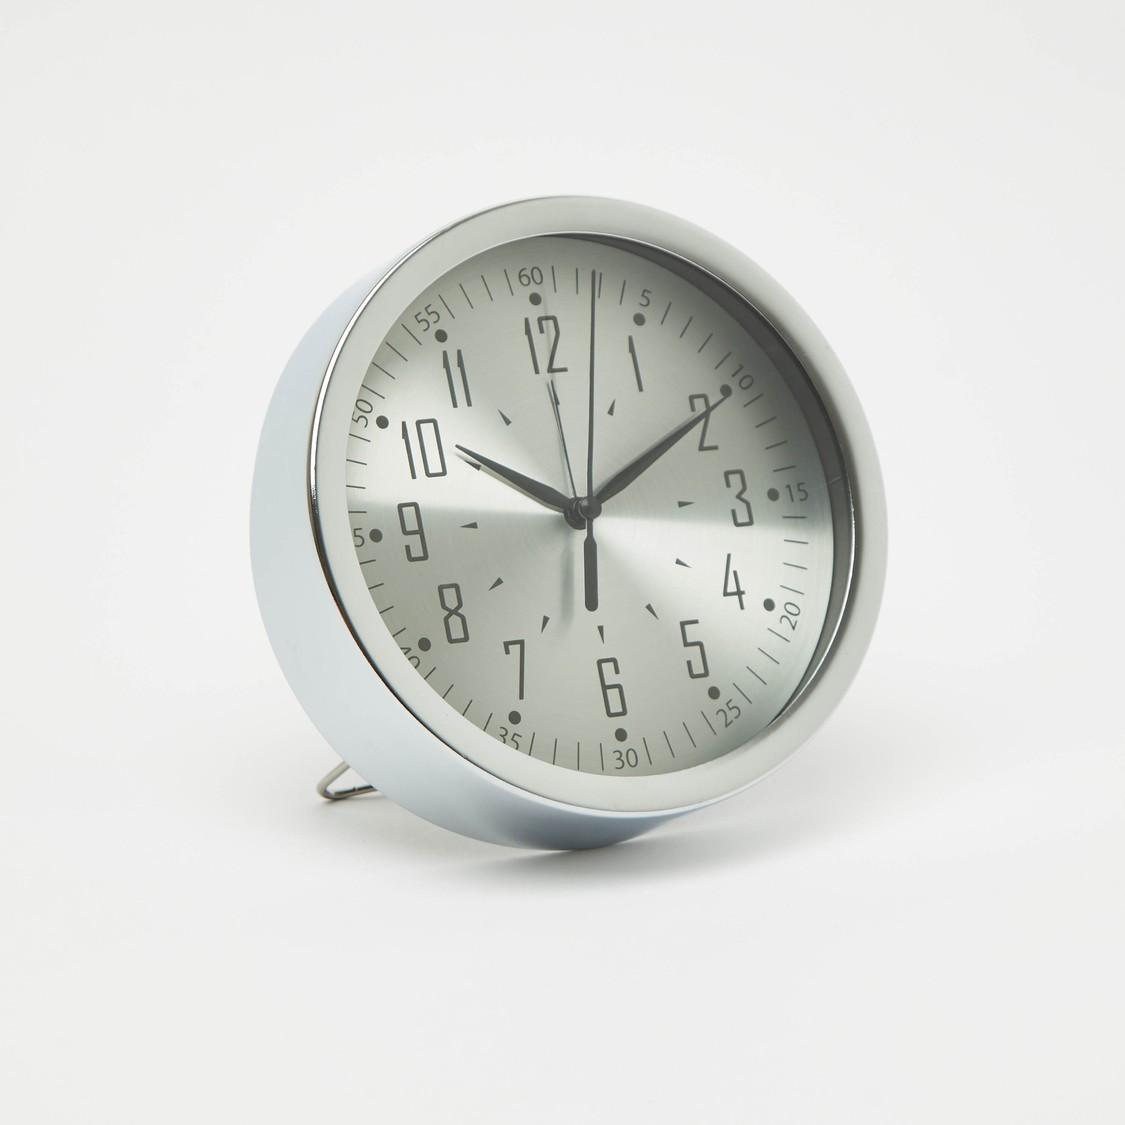 Round Analog Table Clock